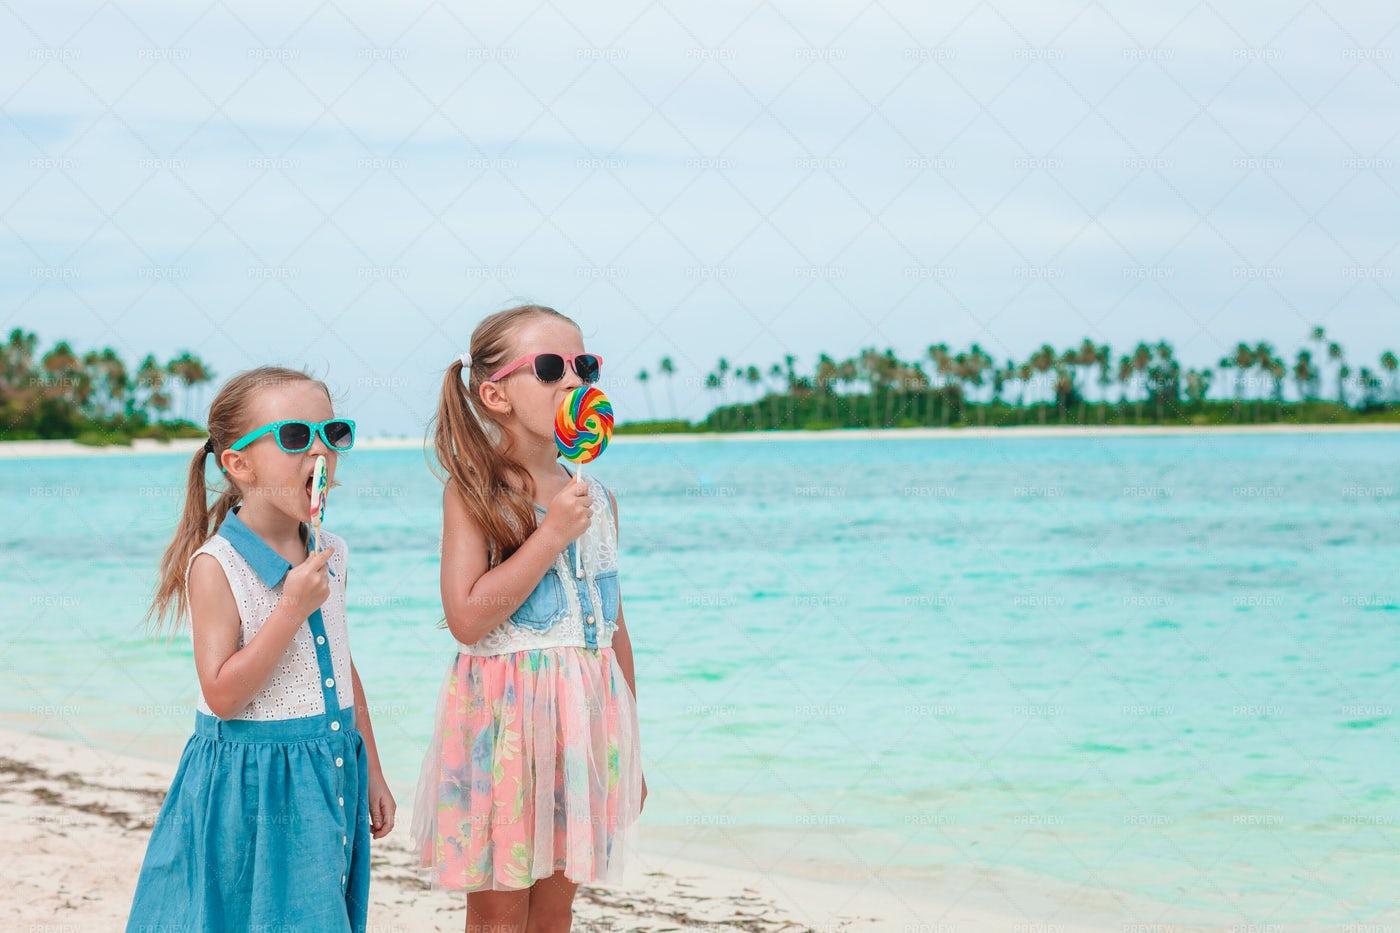 Lollipops At The Beach: Stock Photos